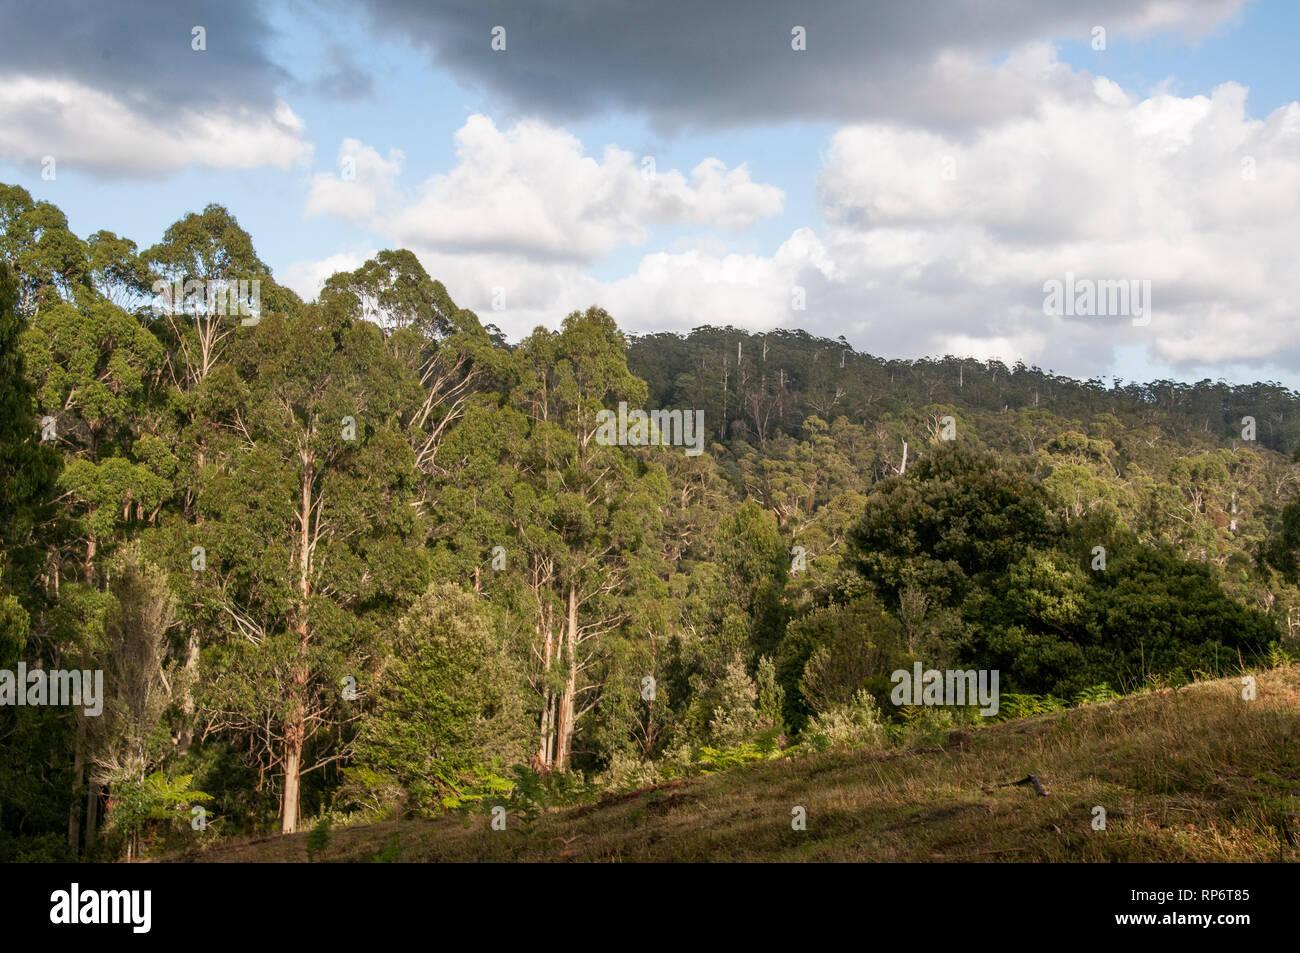 Native eucalypt forest of the Otway Ranges near Marengo, Great Ocean Road, Victoria, Australia - Stock Image